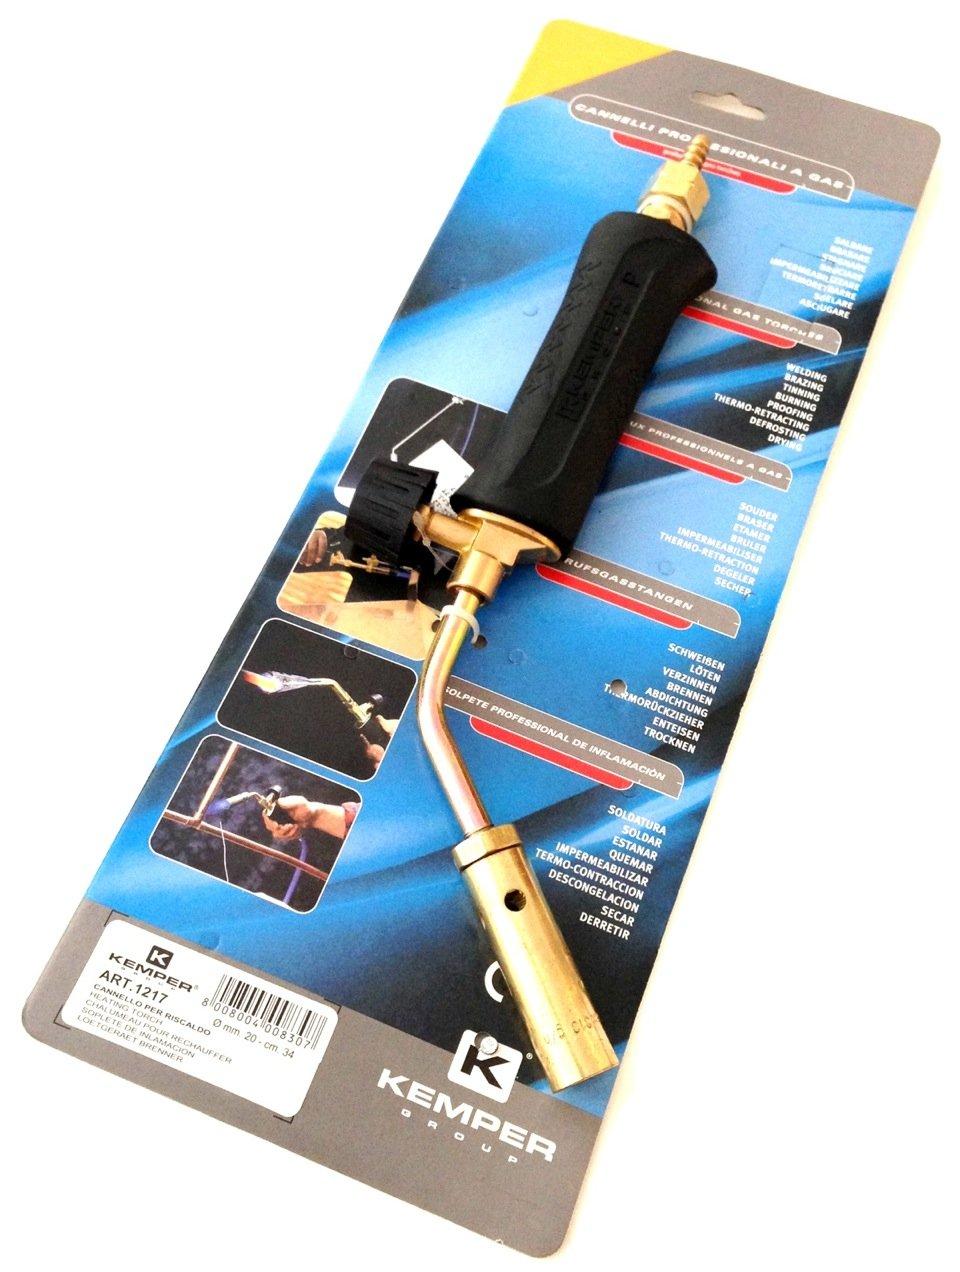 Degiklis KEMPER T12170, 20 mm